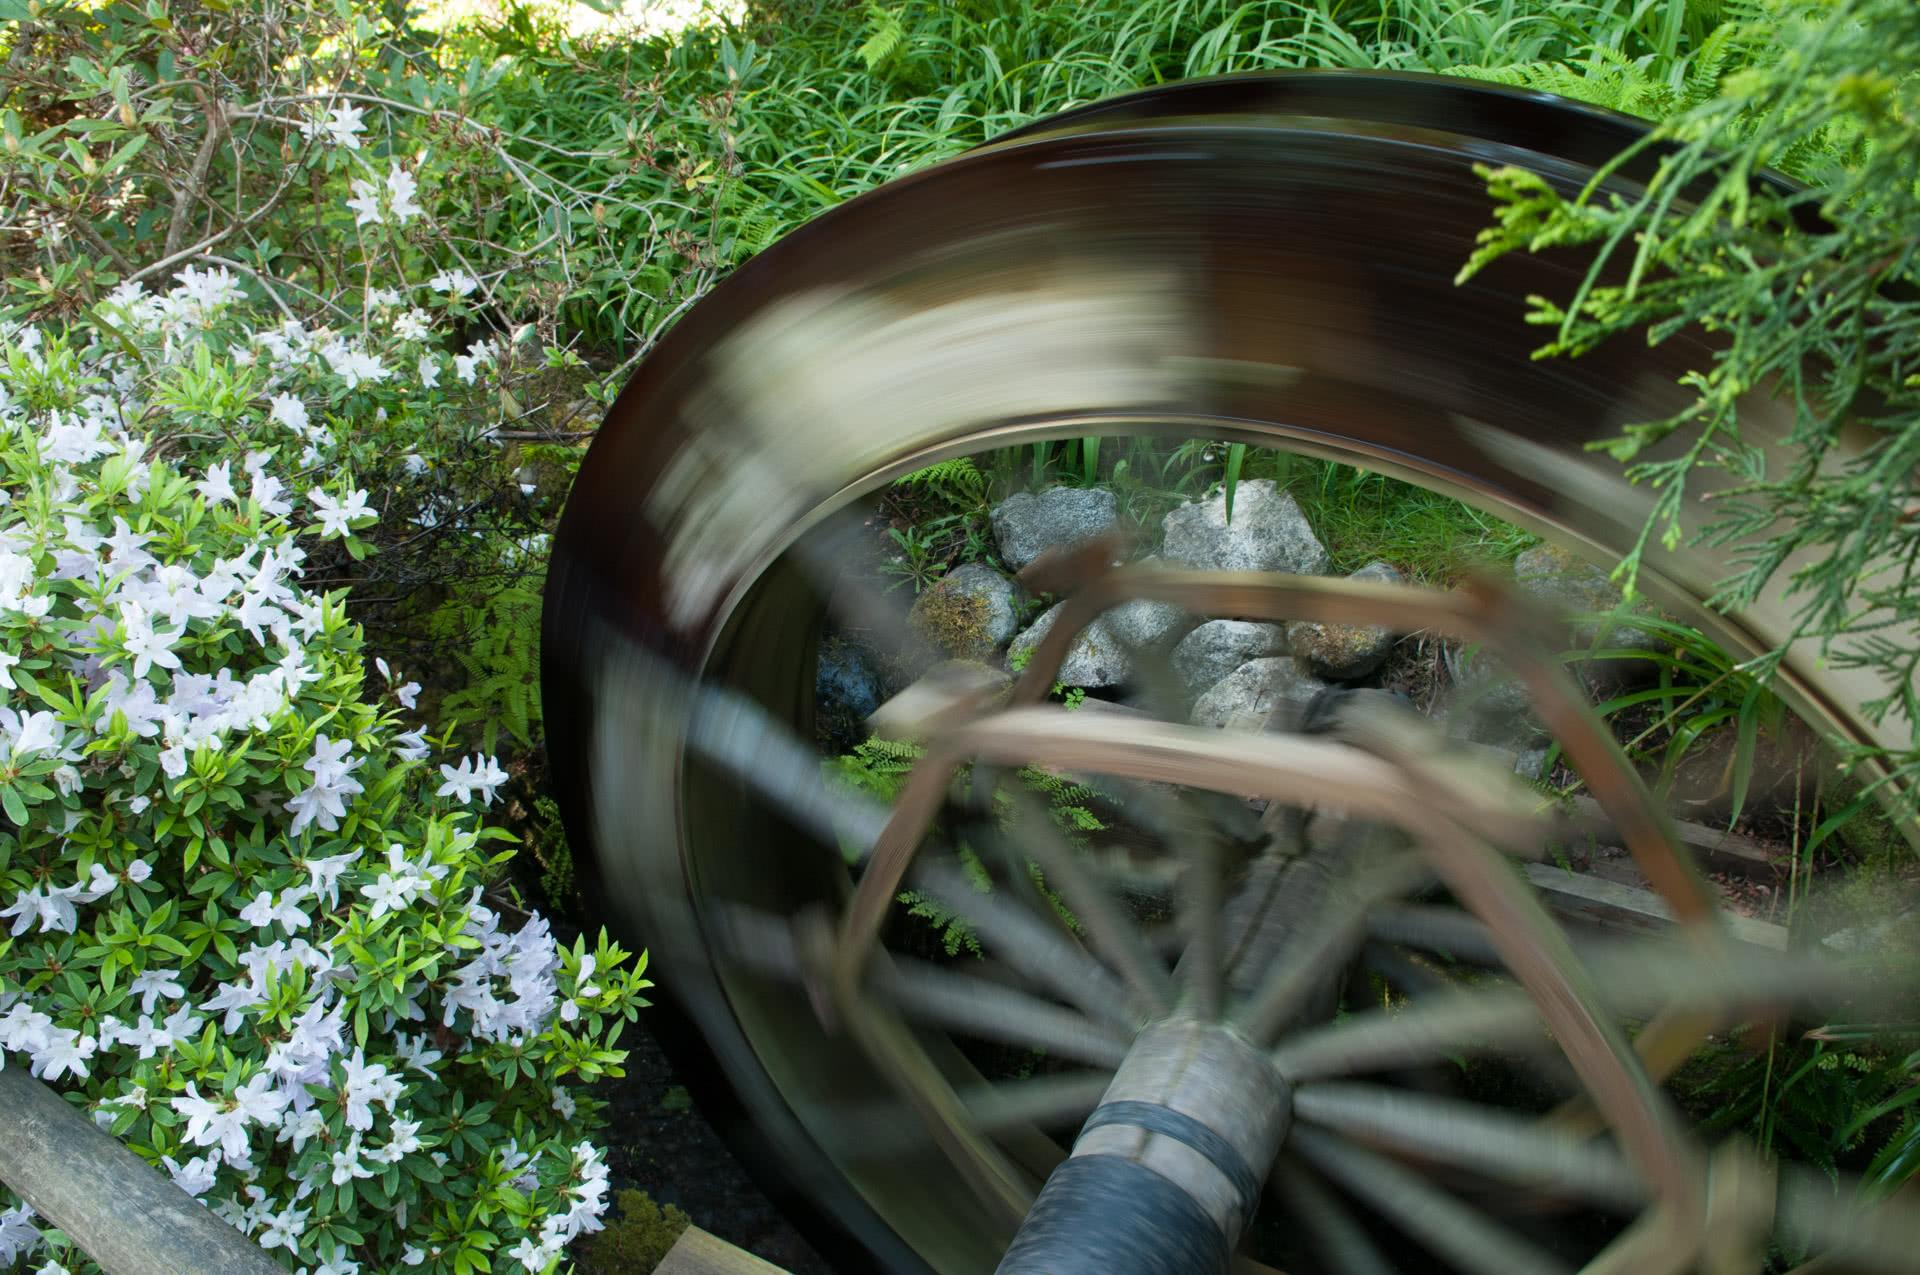 Water wheel in Japanese Garden